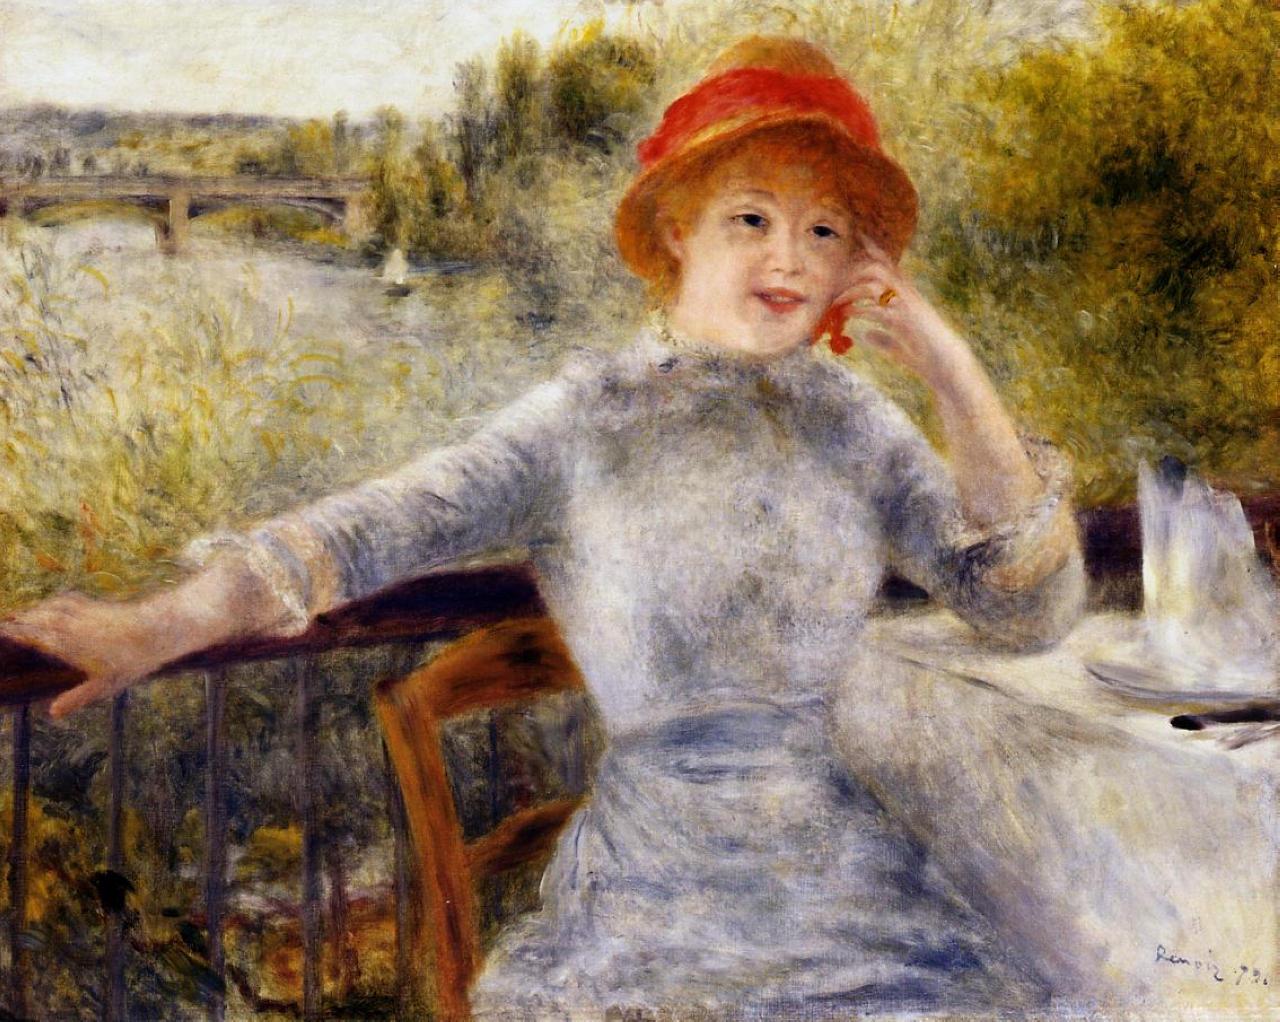 Alphonsine Fournasie on the Isle of Chatou  - Pierre-Auguste Renoir (Image: www.wikiart.org)